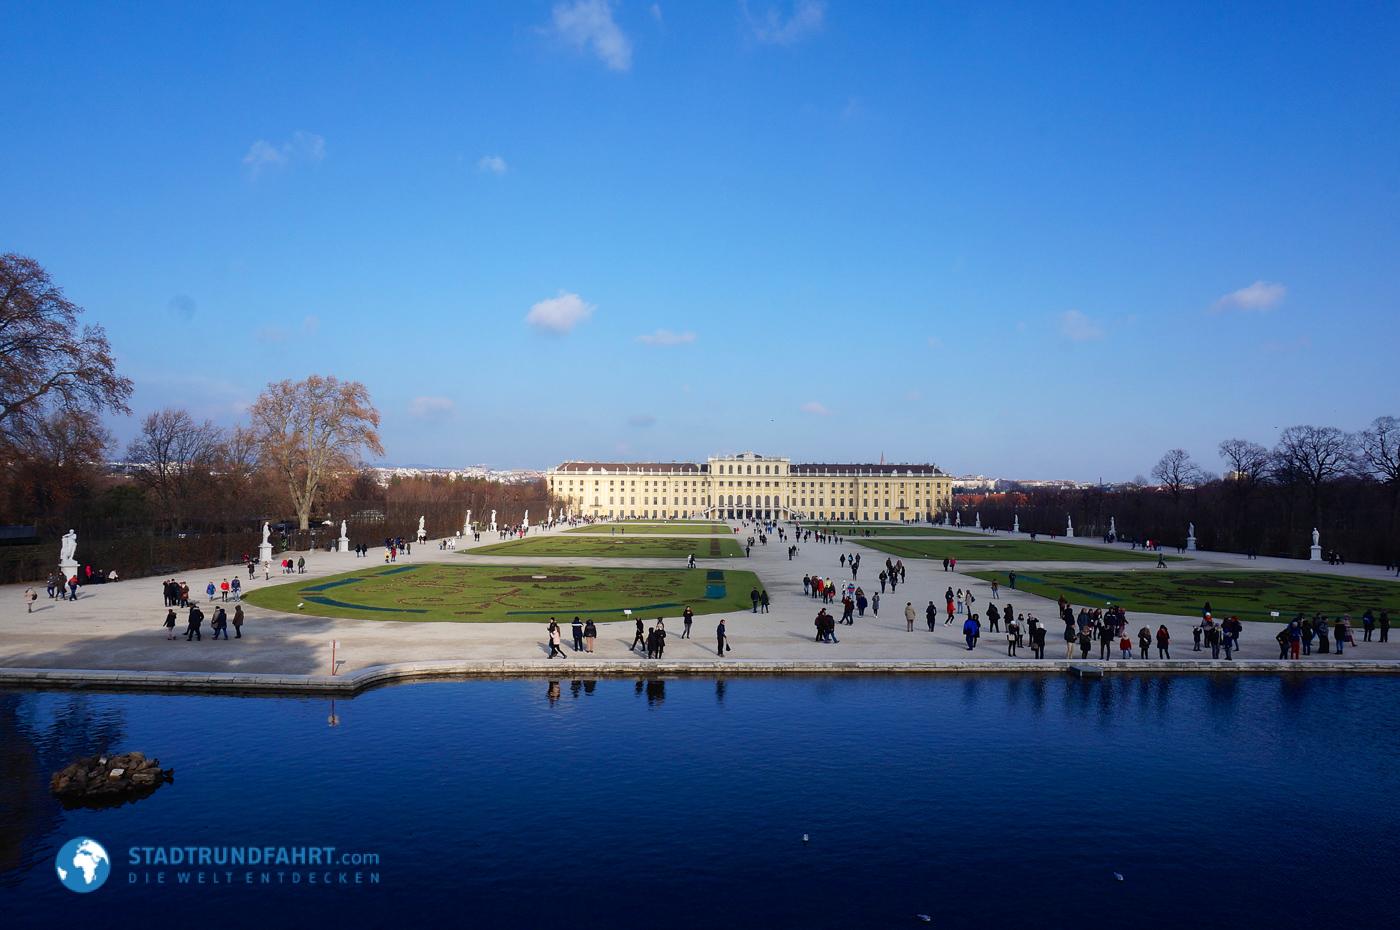 Ein Winterspaziergang am Schloss Schönbrunn in Wien